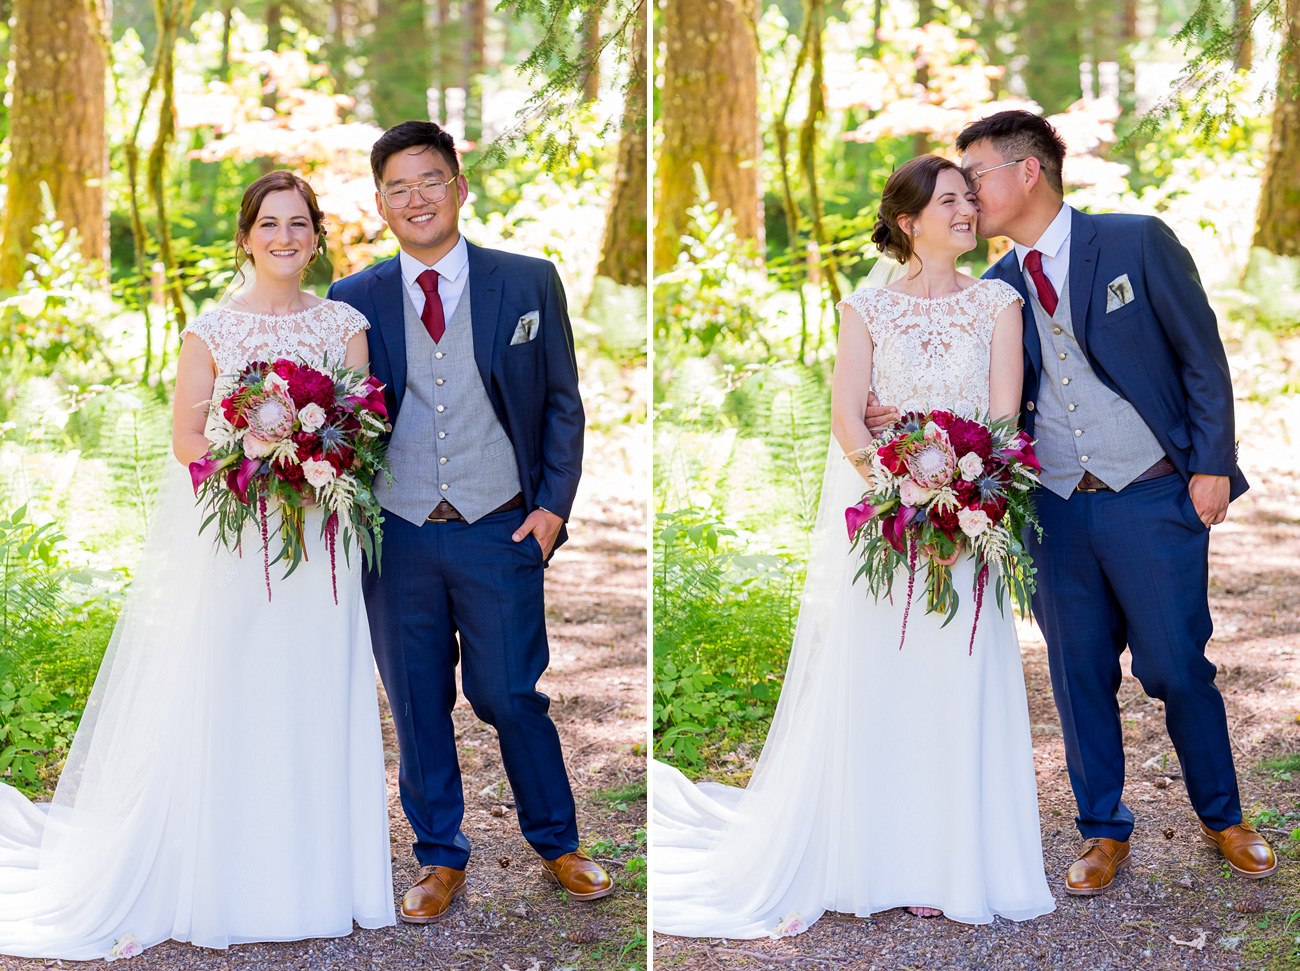 loloma-lodge-oregon-wedding-59 Loloma Lodge Oregon Wedding | Anna & Justin | Traditional Korean Tea Ceremony